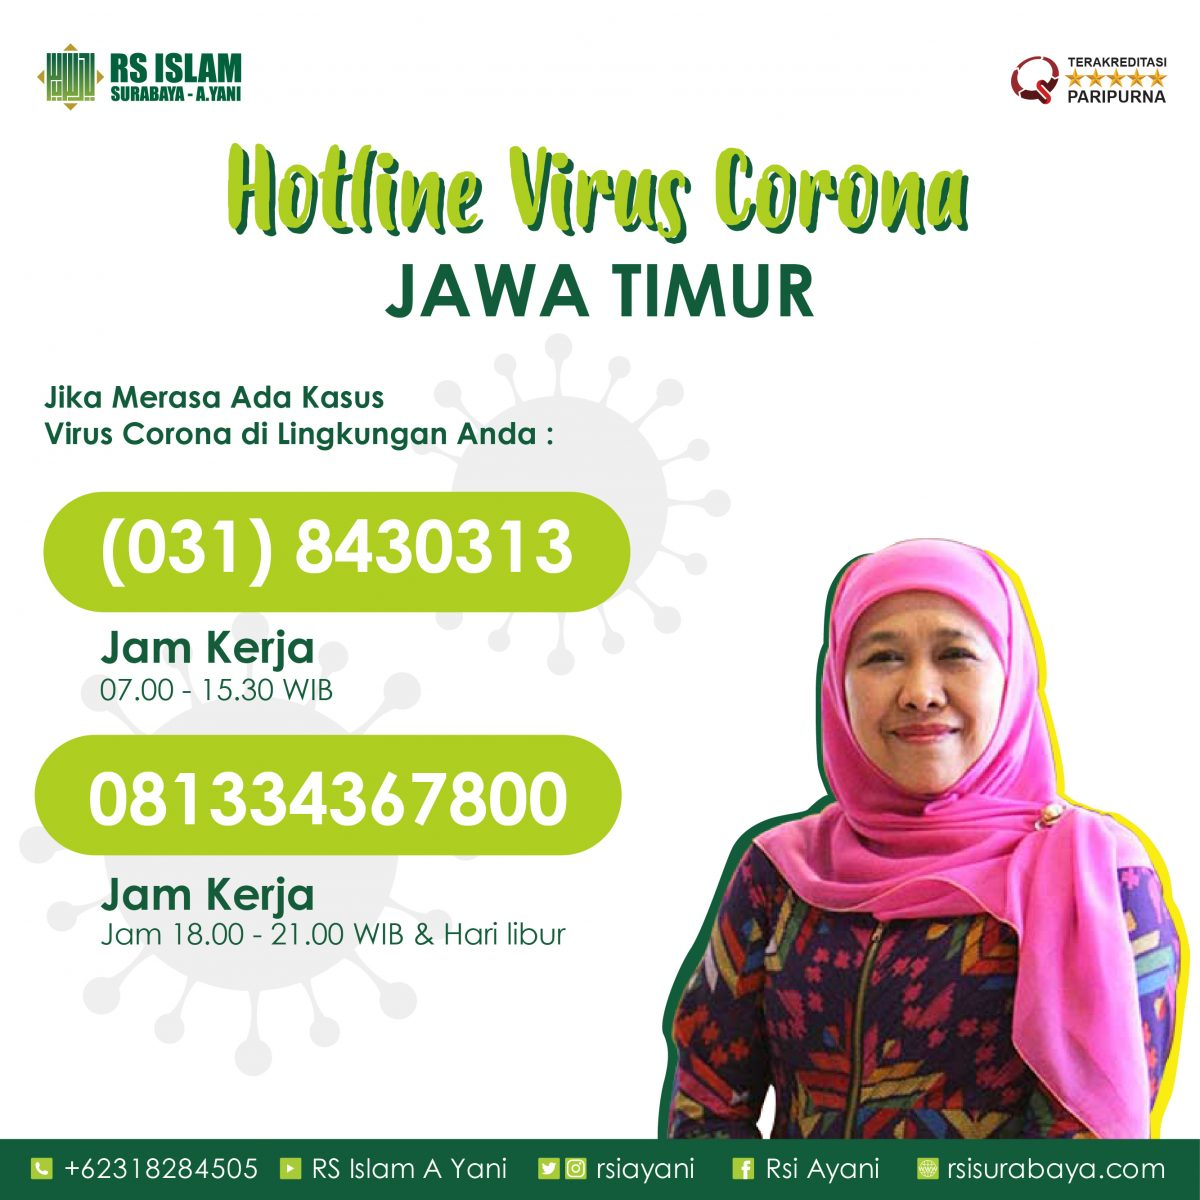 hotline-virus-corona-jawa-timur-03-02-1200x1200.jpg